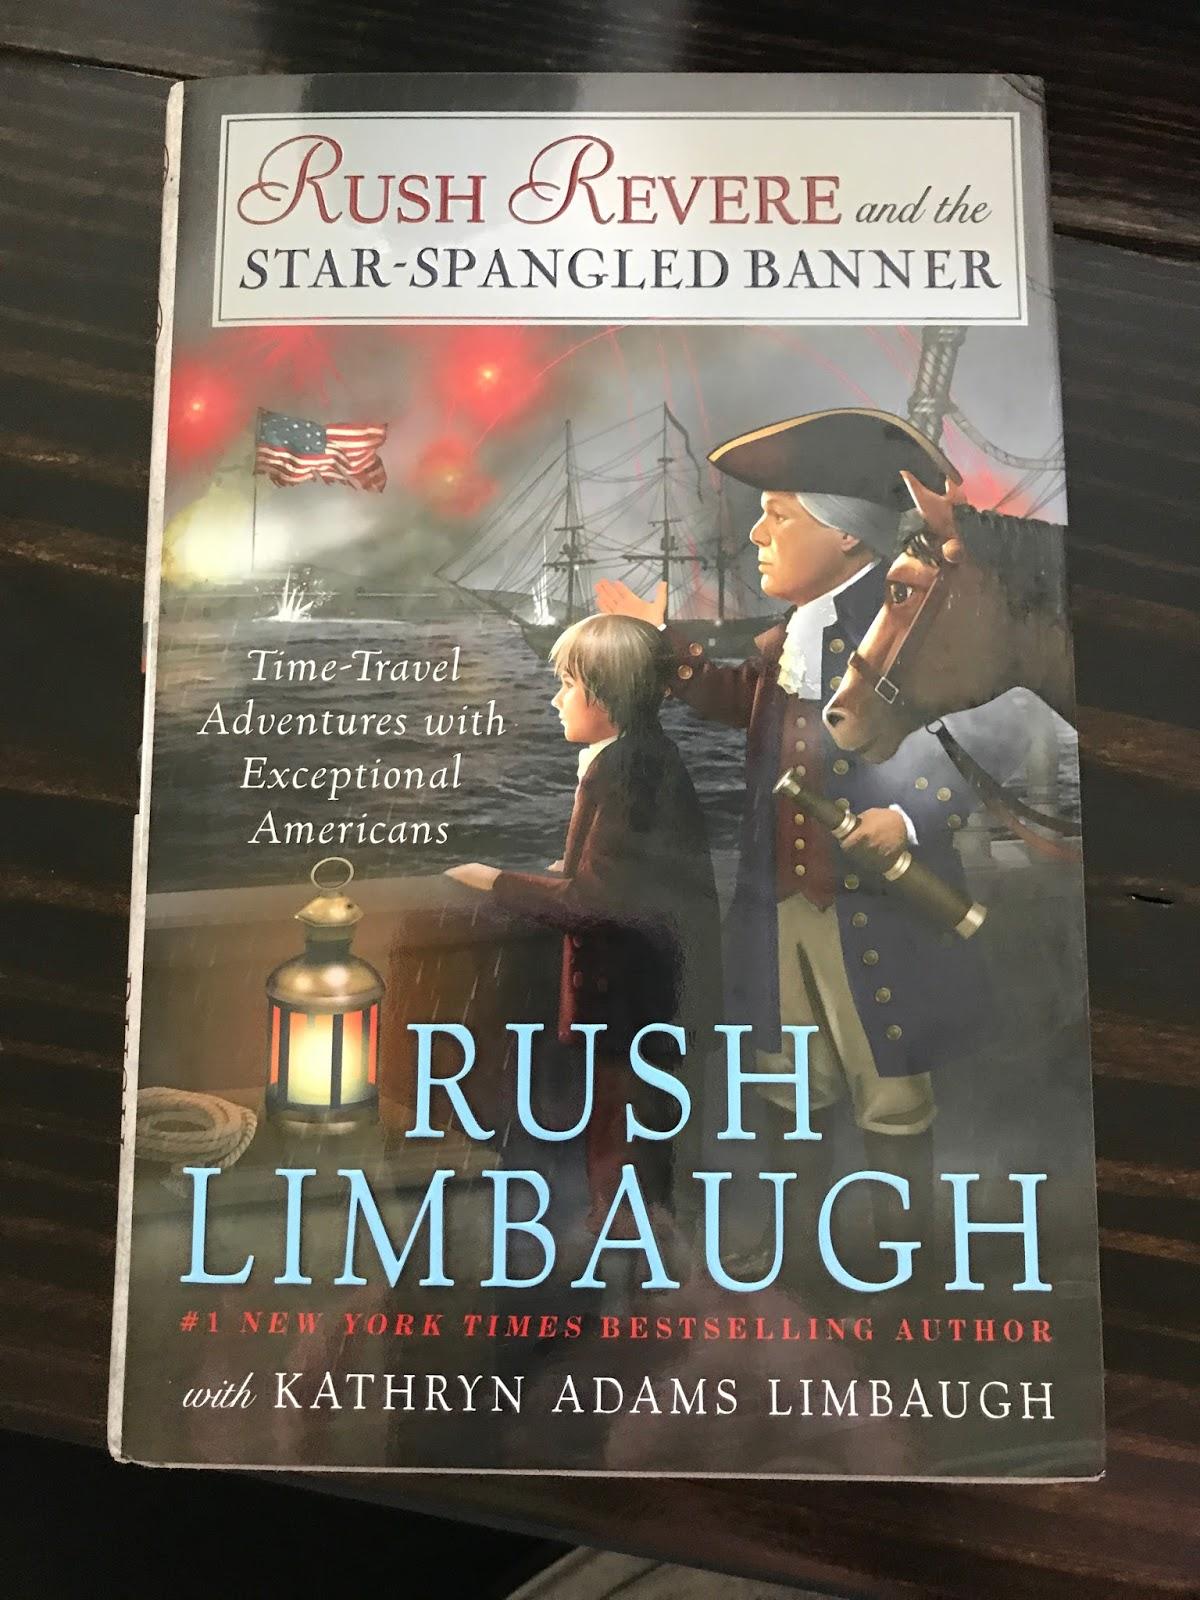 Abc S And Sweet Tea Adventures Of Rush Revere Book Series From Adventures Of Rush Revere 1 New